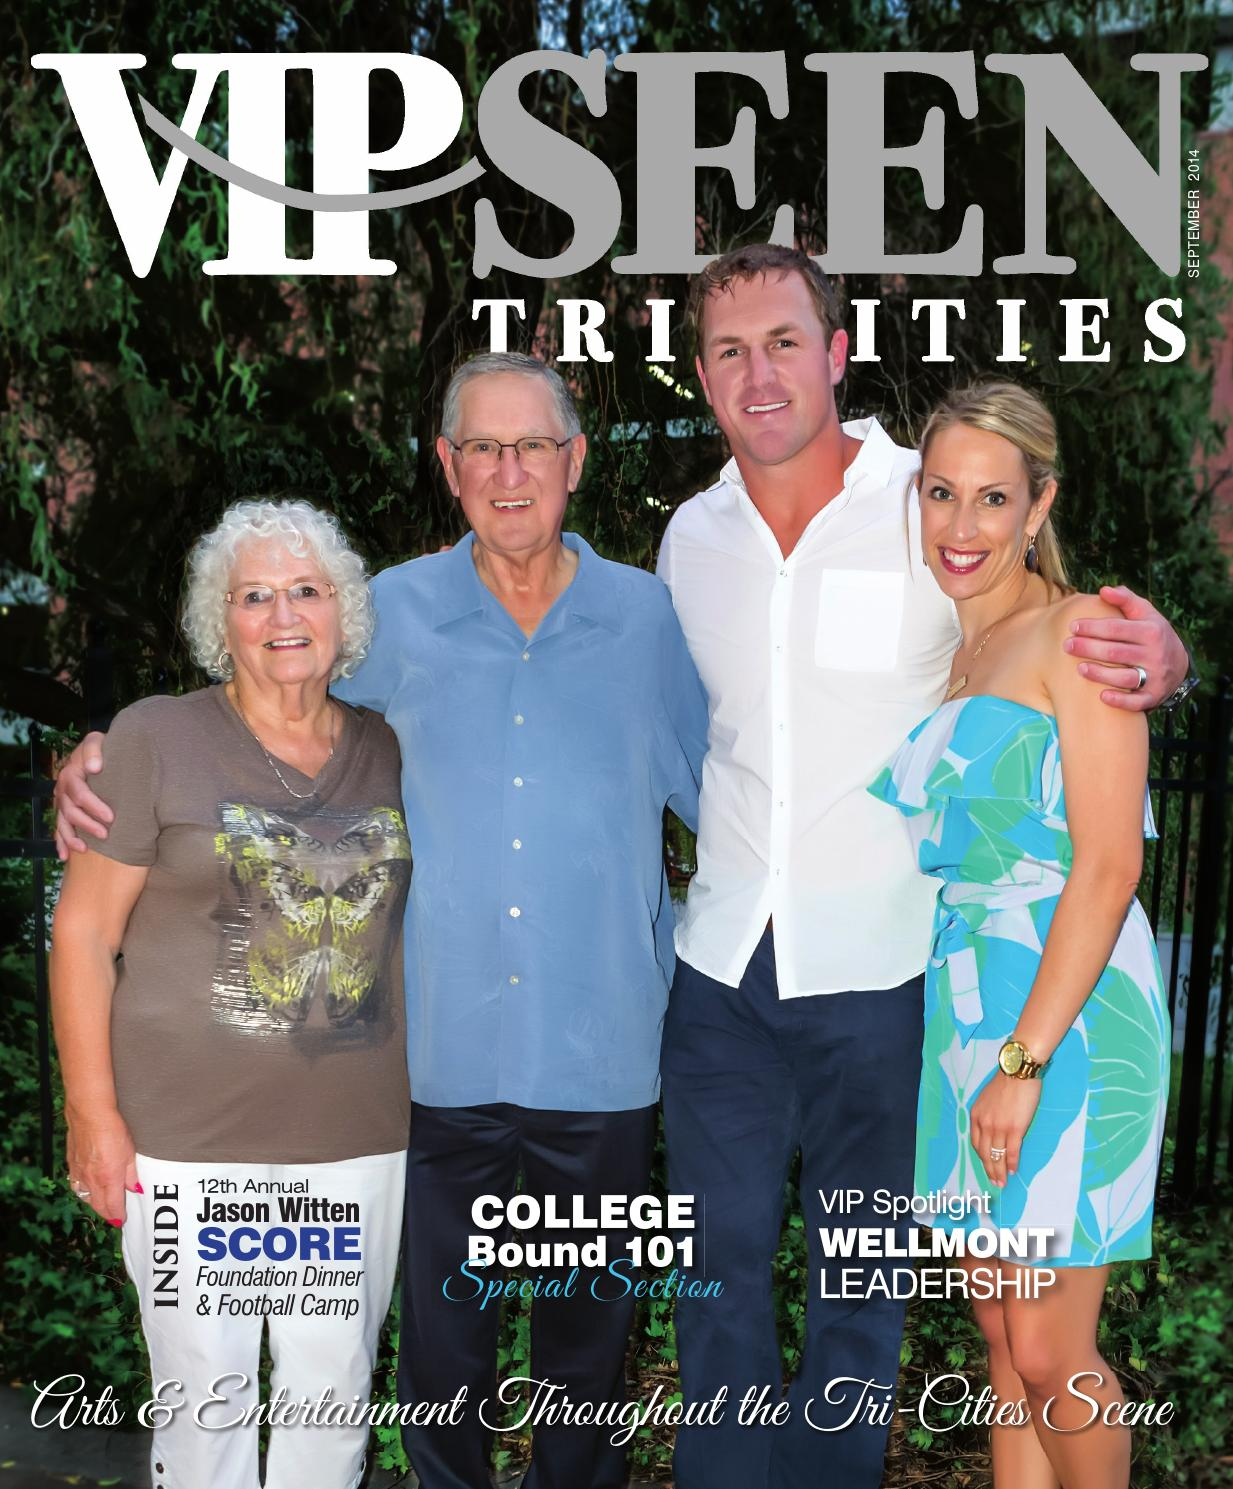 Vipsept10 lr by VIPSEEN   issuu